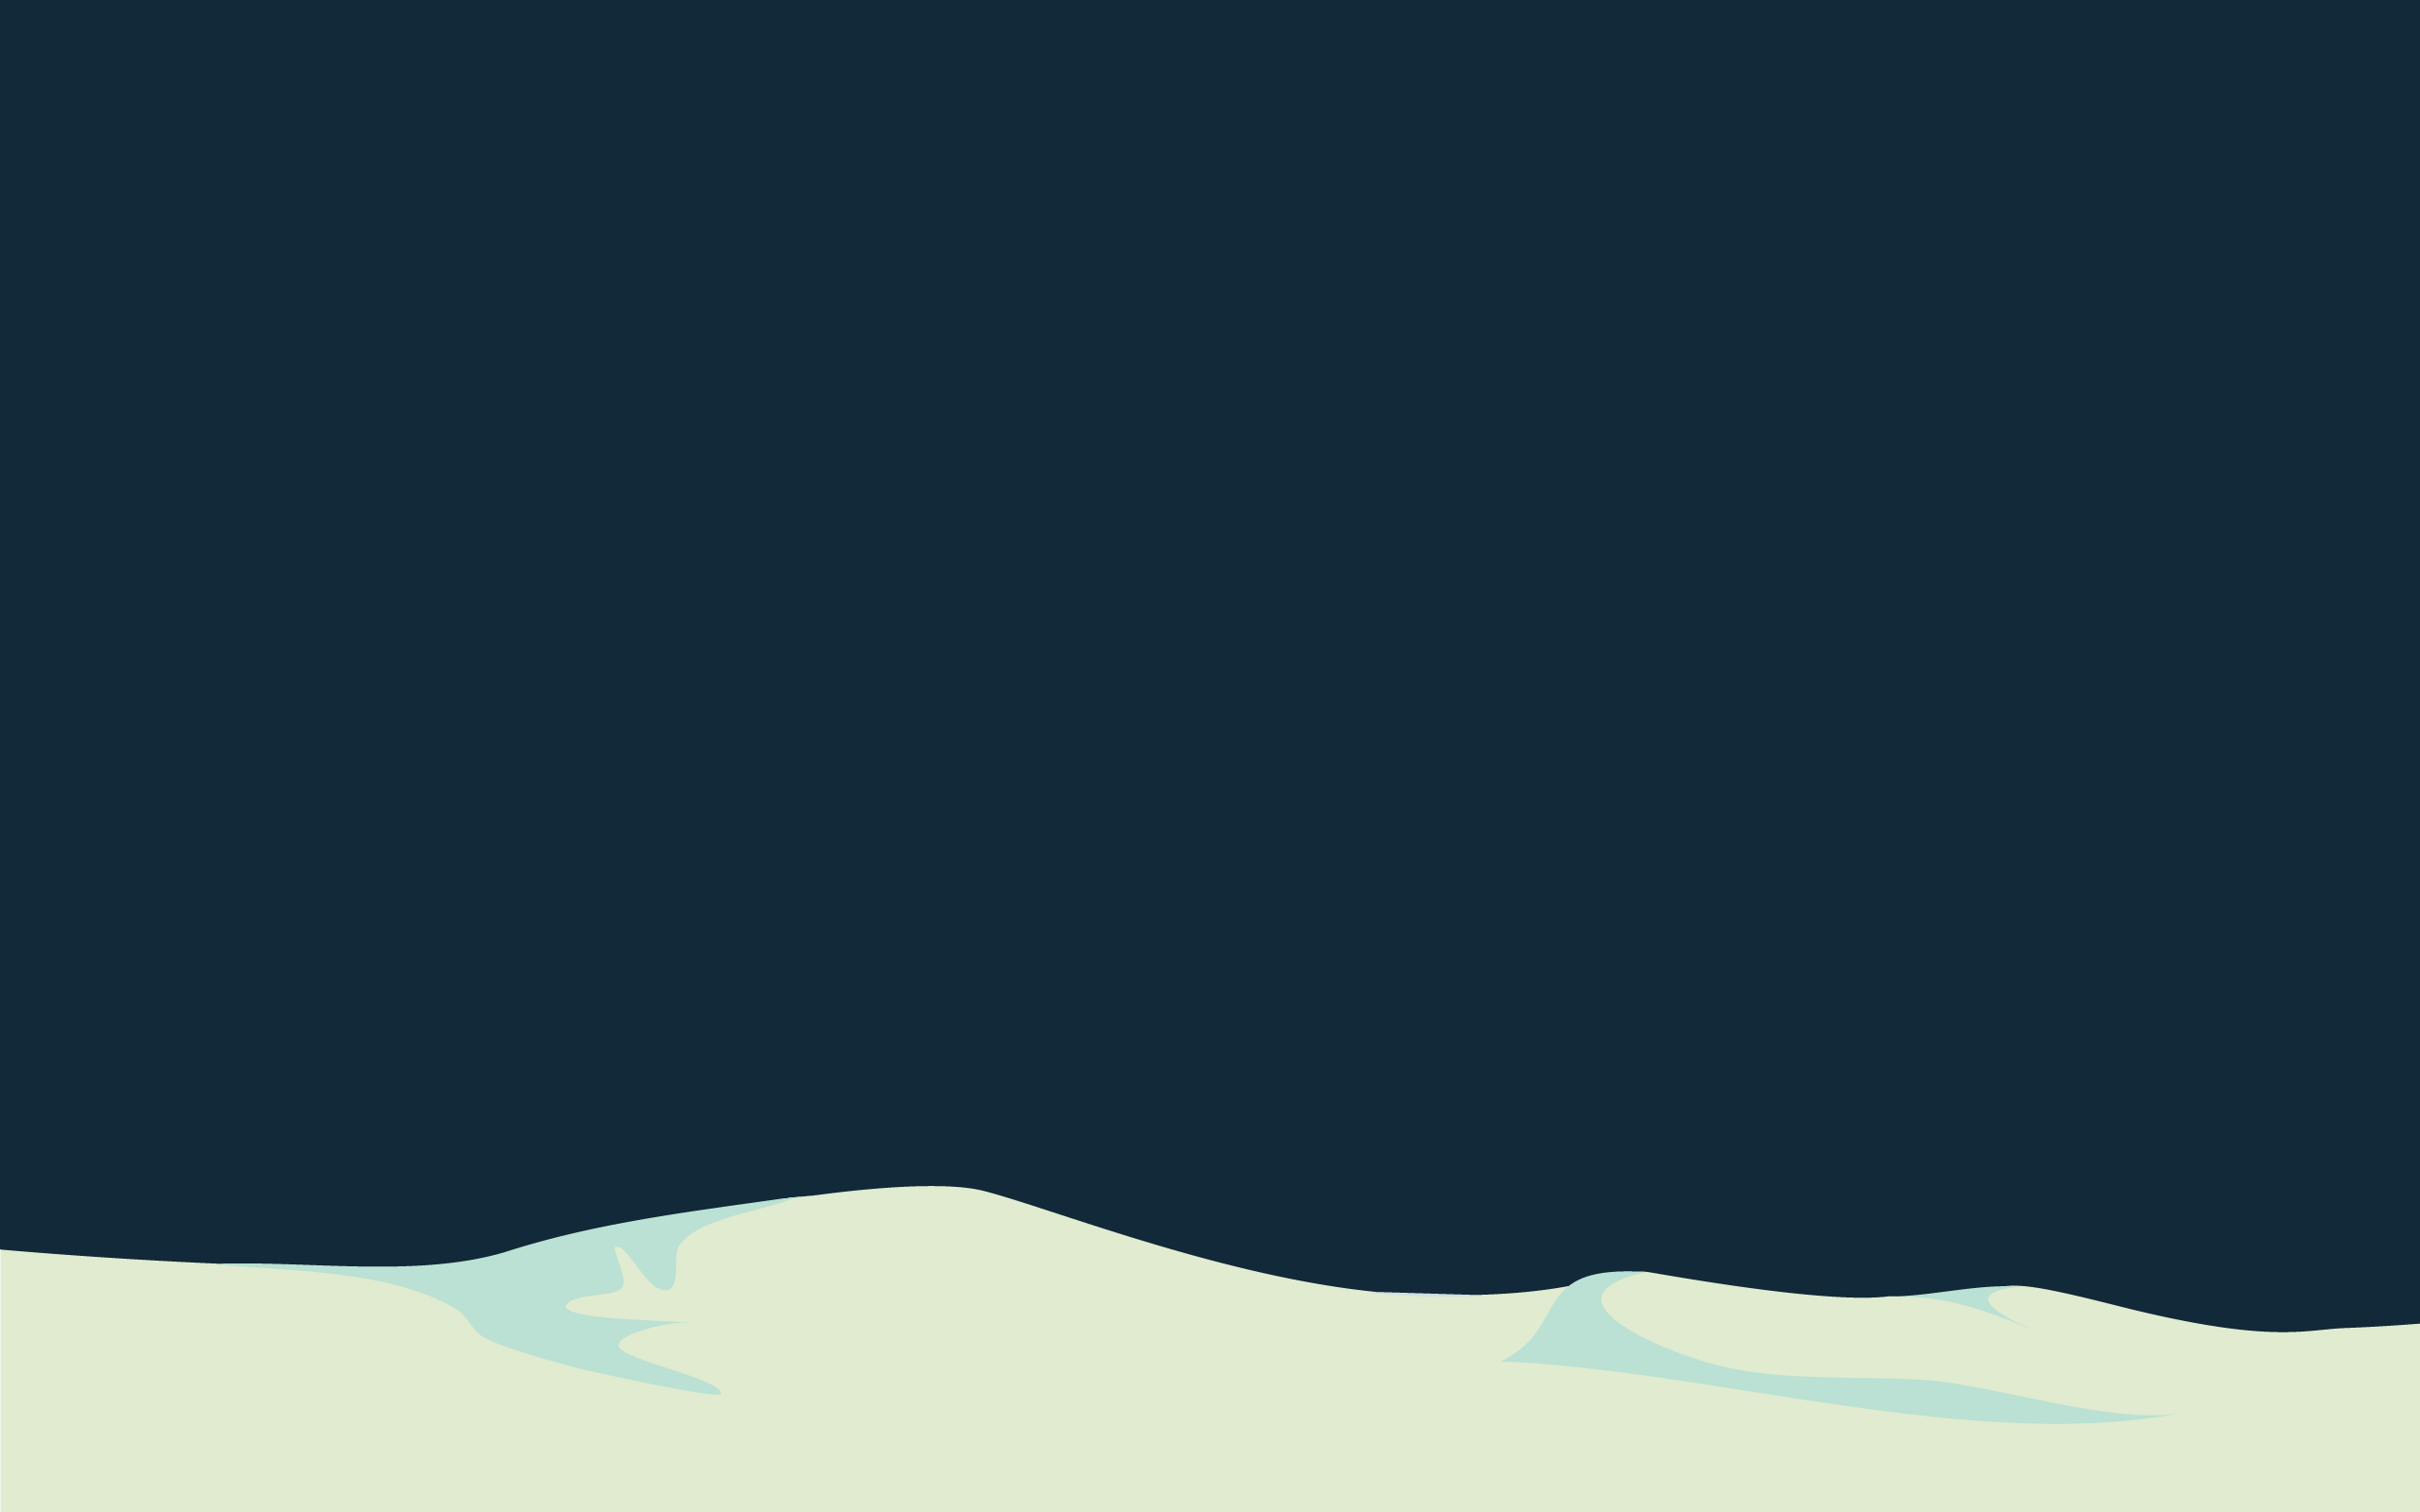 150 simple desktop wallpapers for minimalist lovers